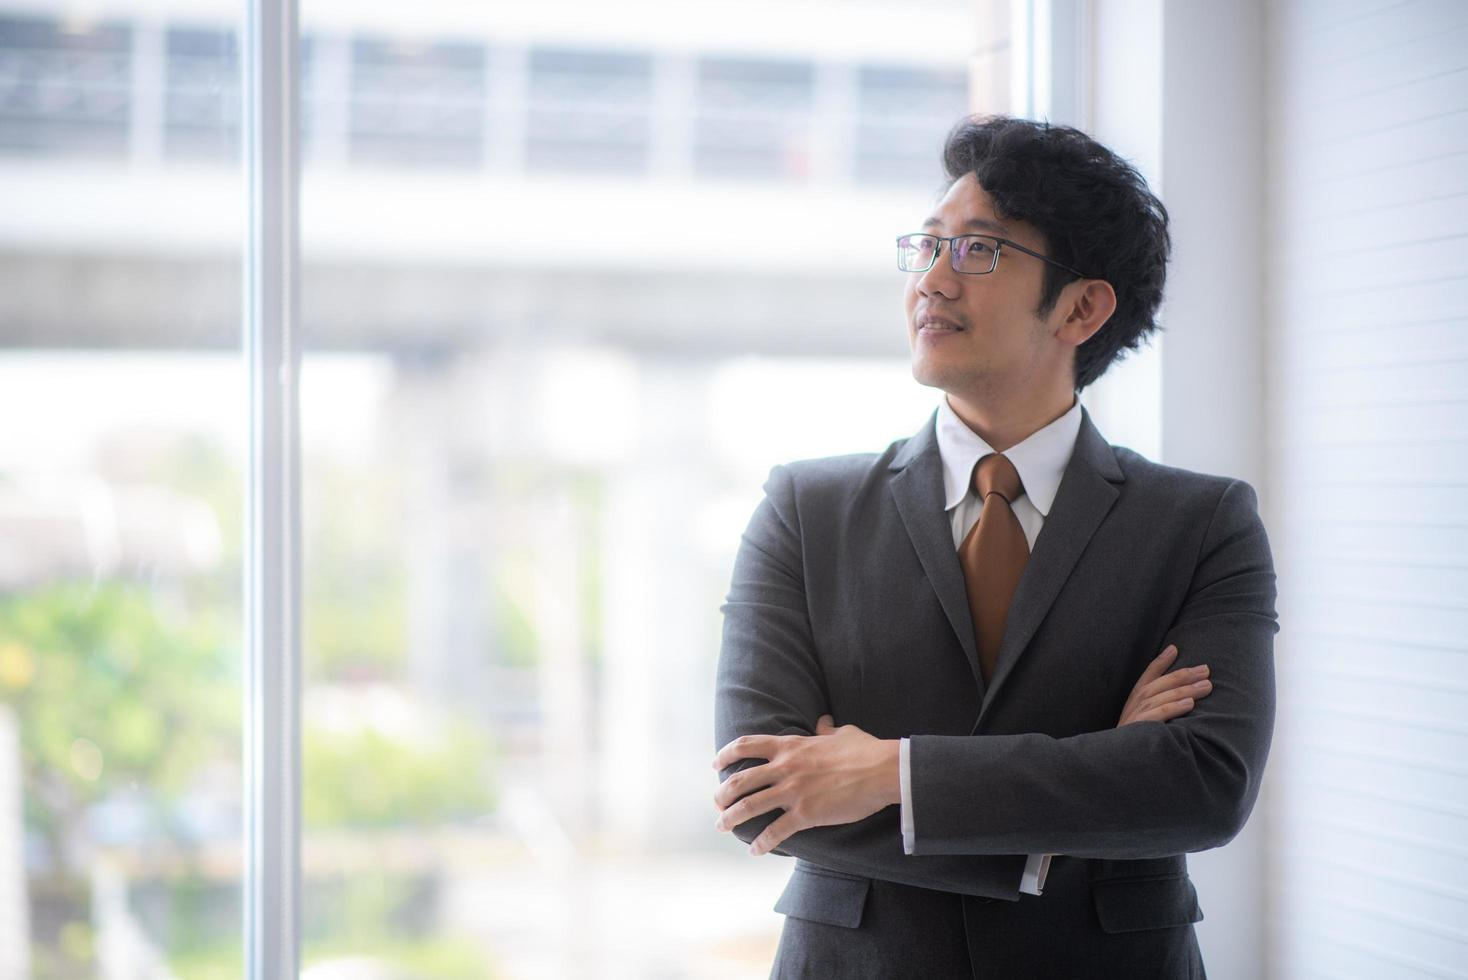 Businessman in a suit photo